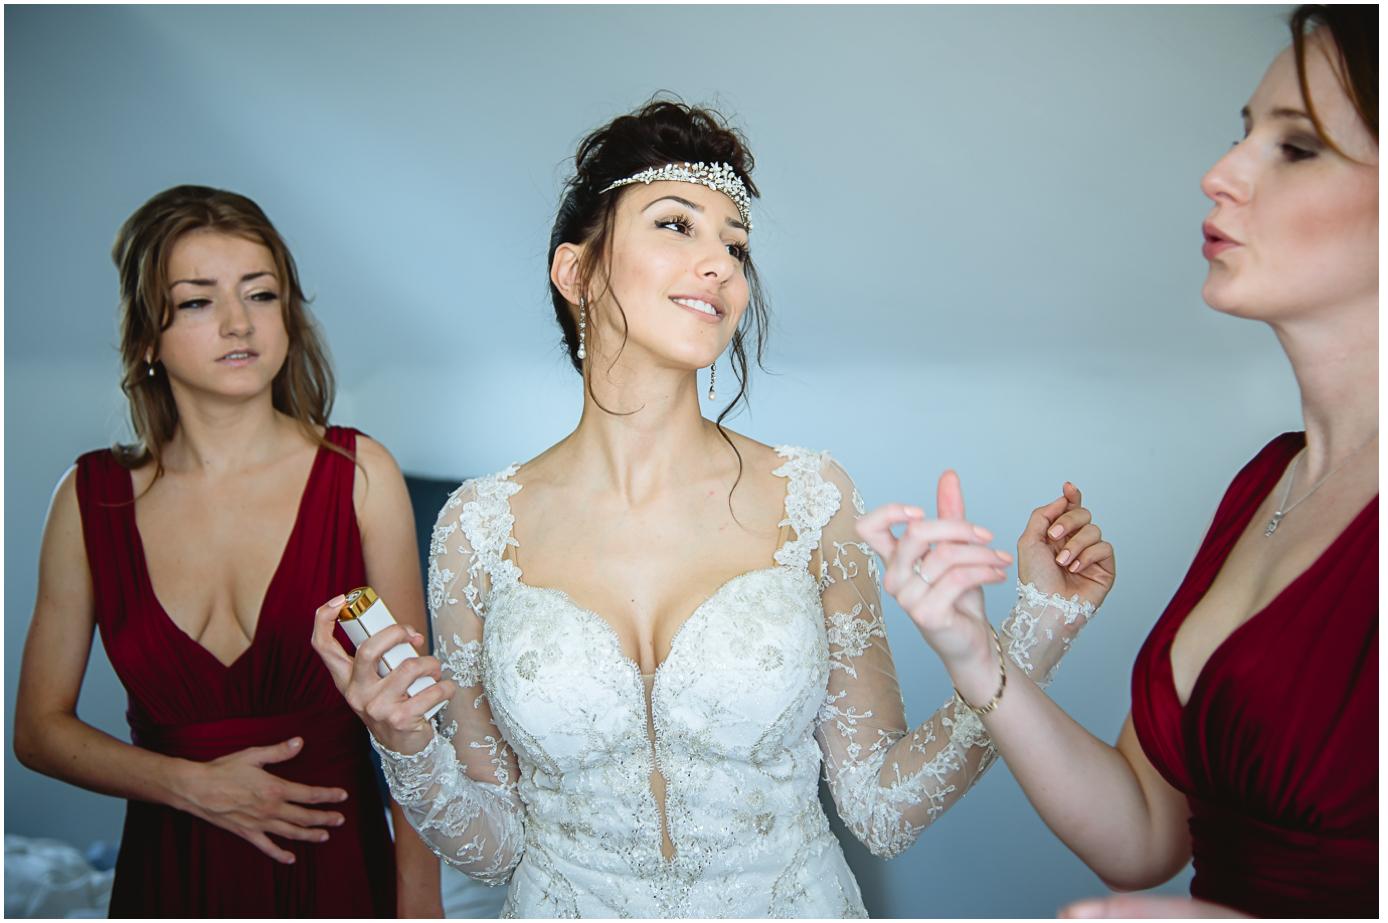 iranian wedding photographer 33 - Drapers Hall London Wedding Photographer